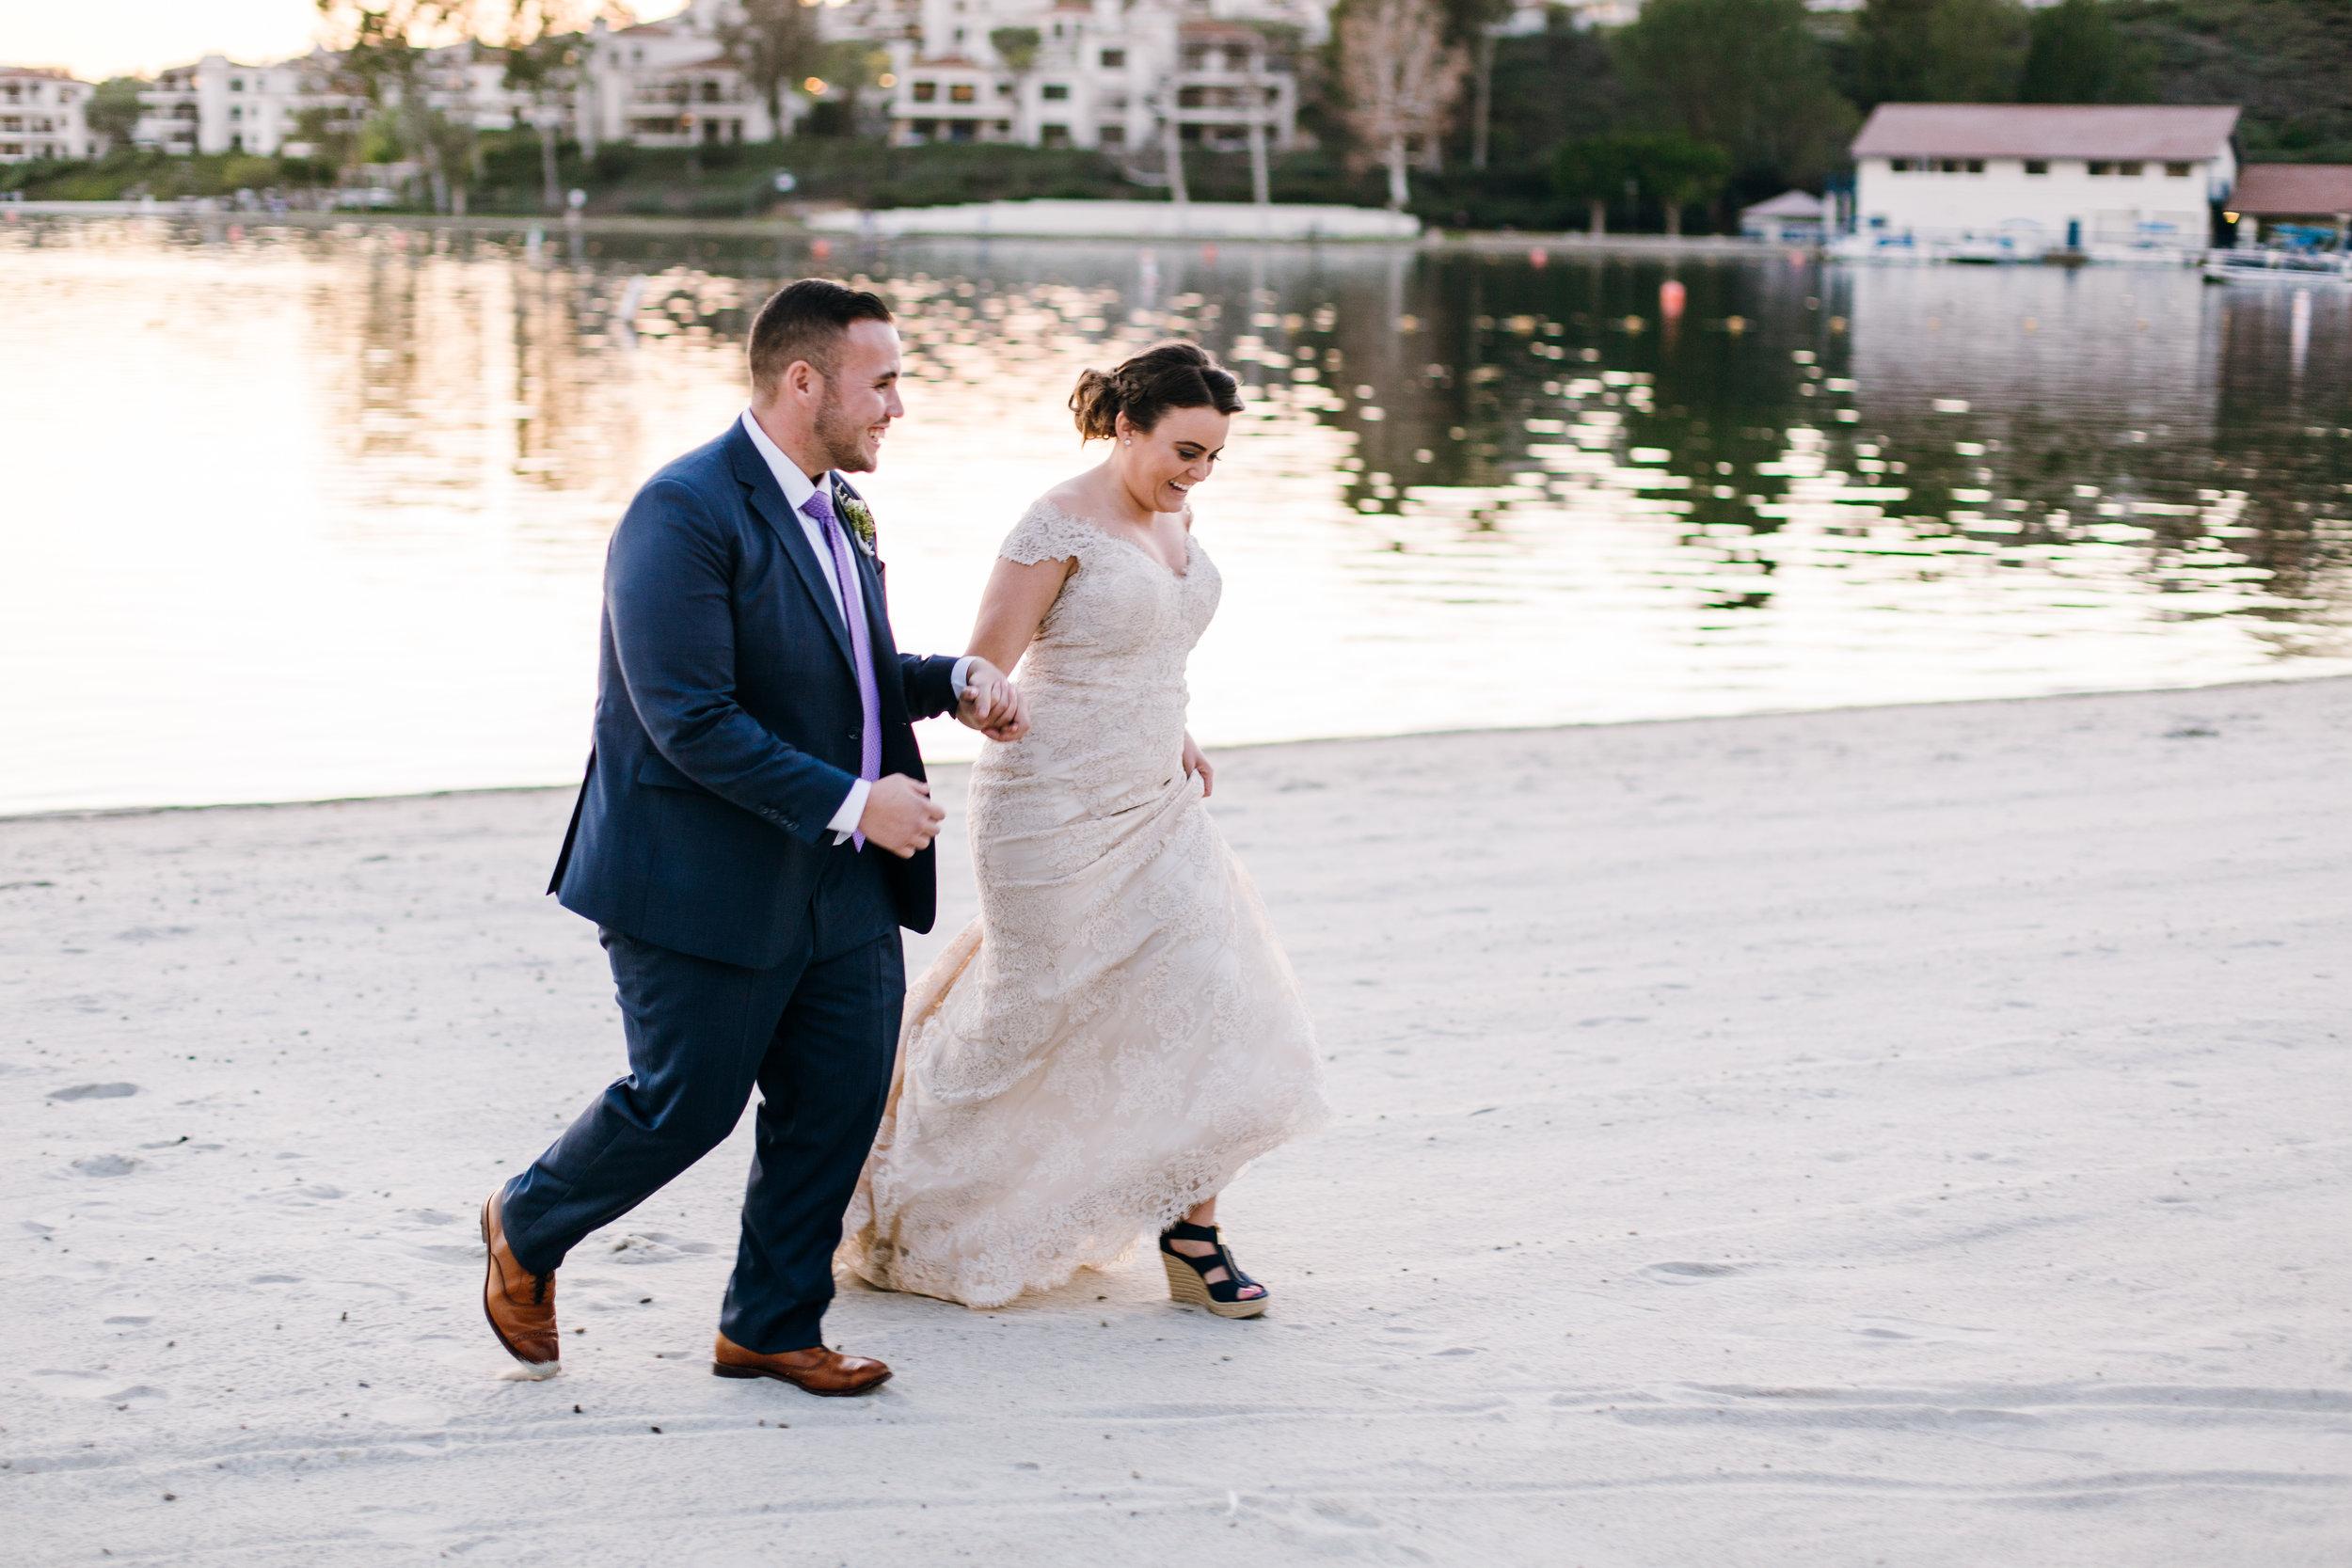 KaraNixonWeddings-DanaPoint-Wedding-end.jpg